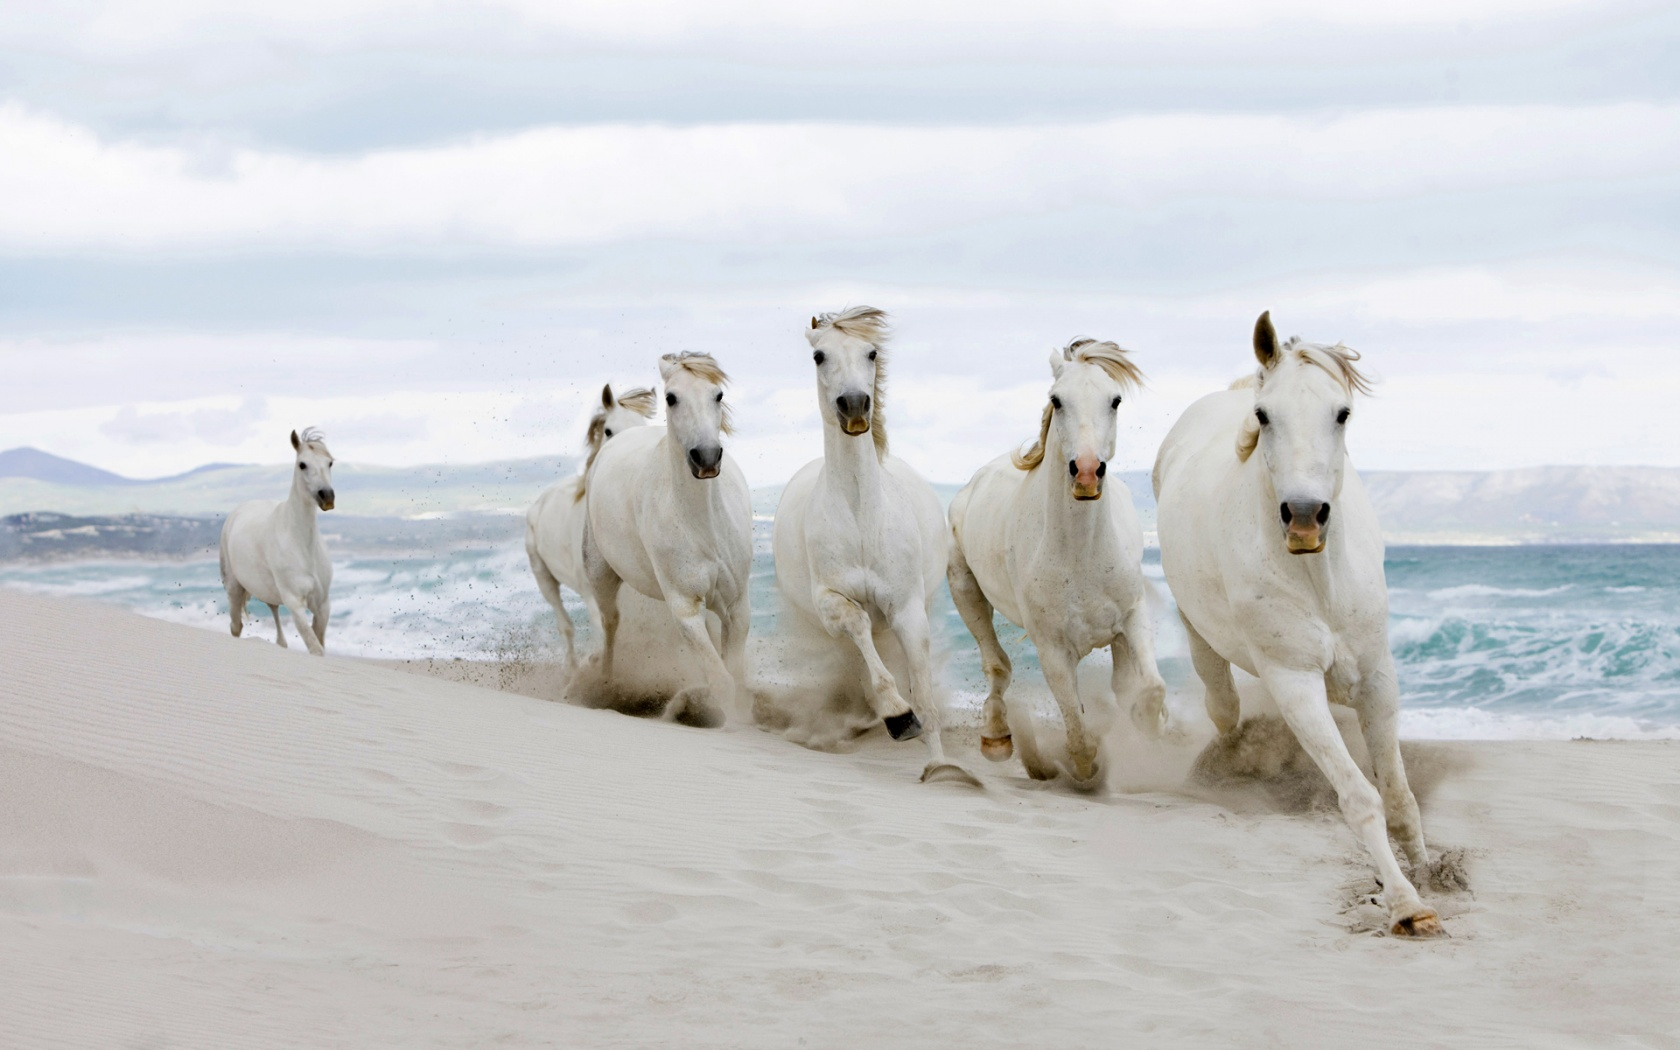 Keywords Seven Running Horses Wallpaper and Tags